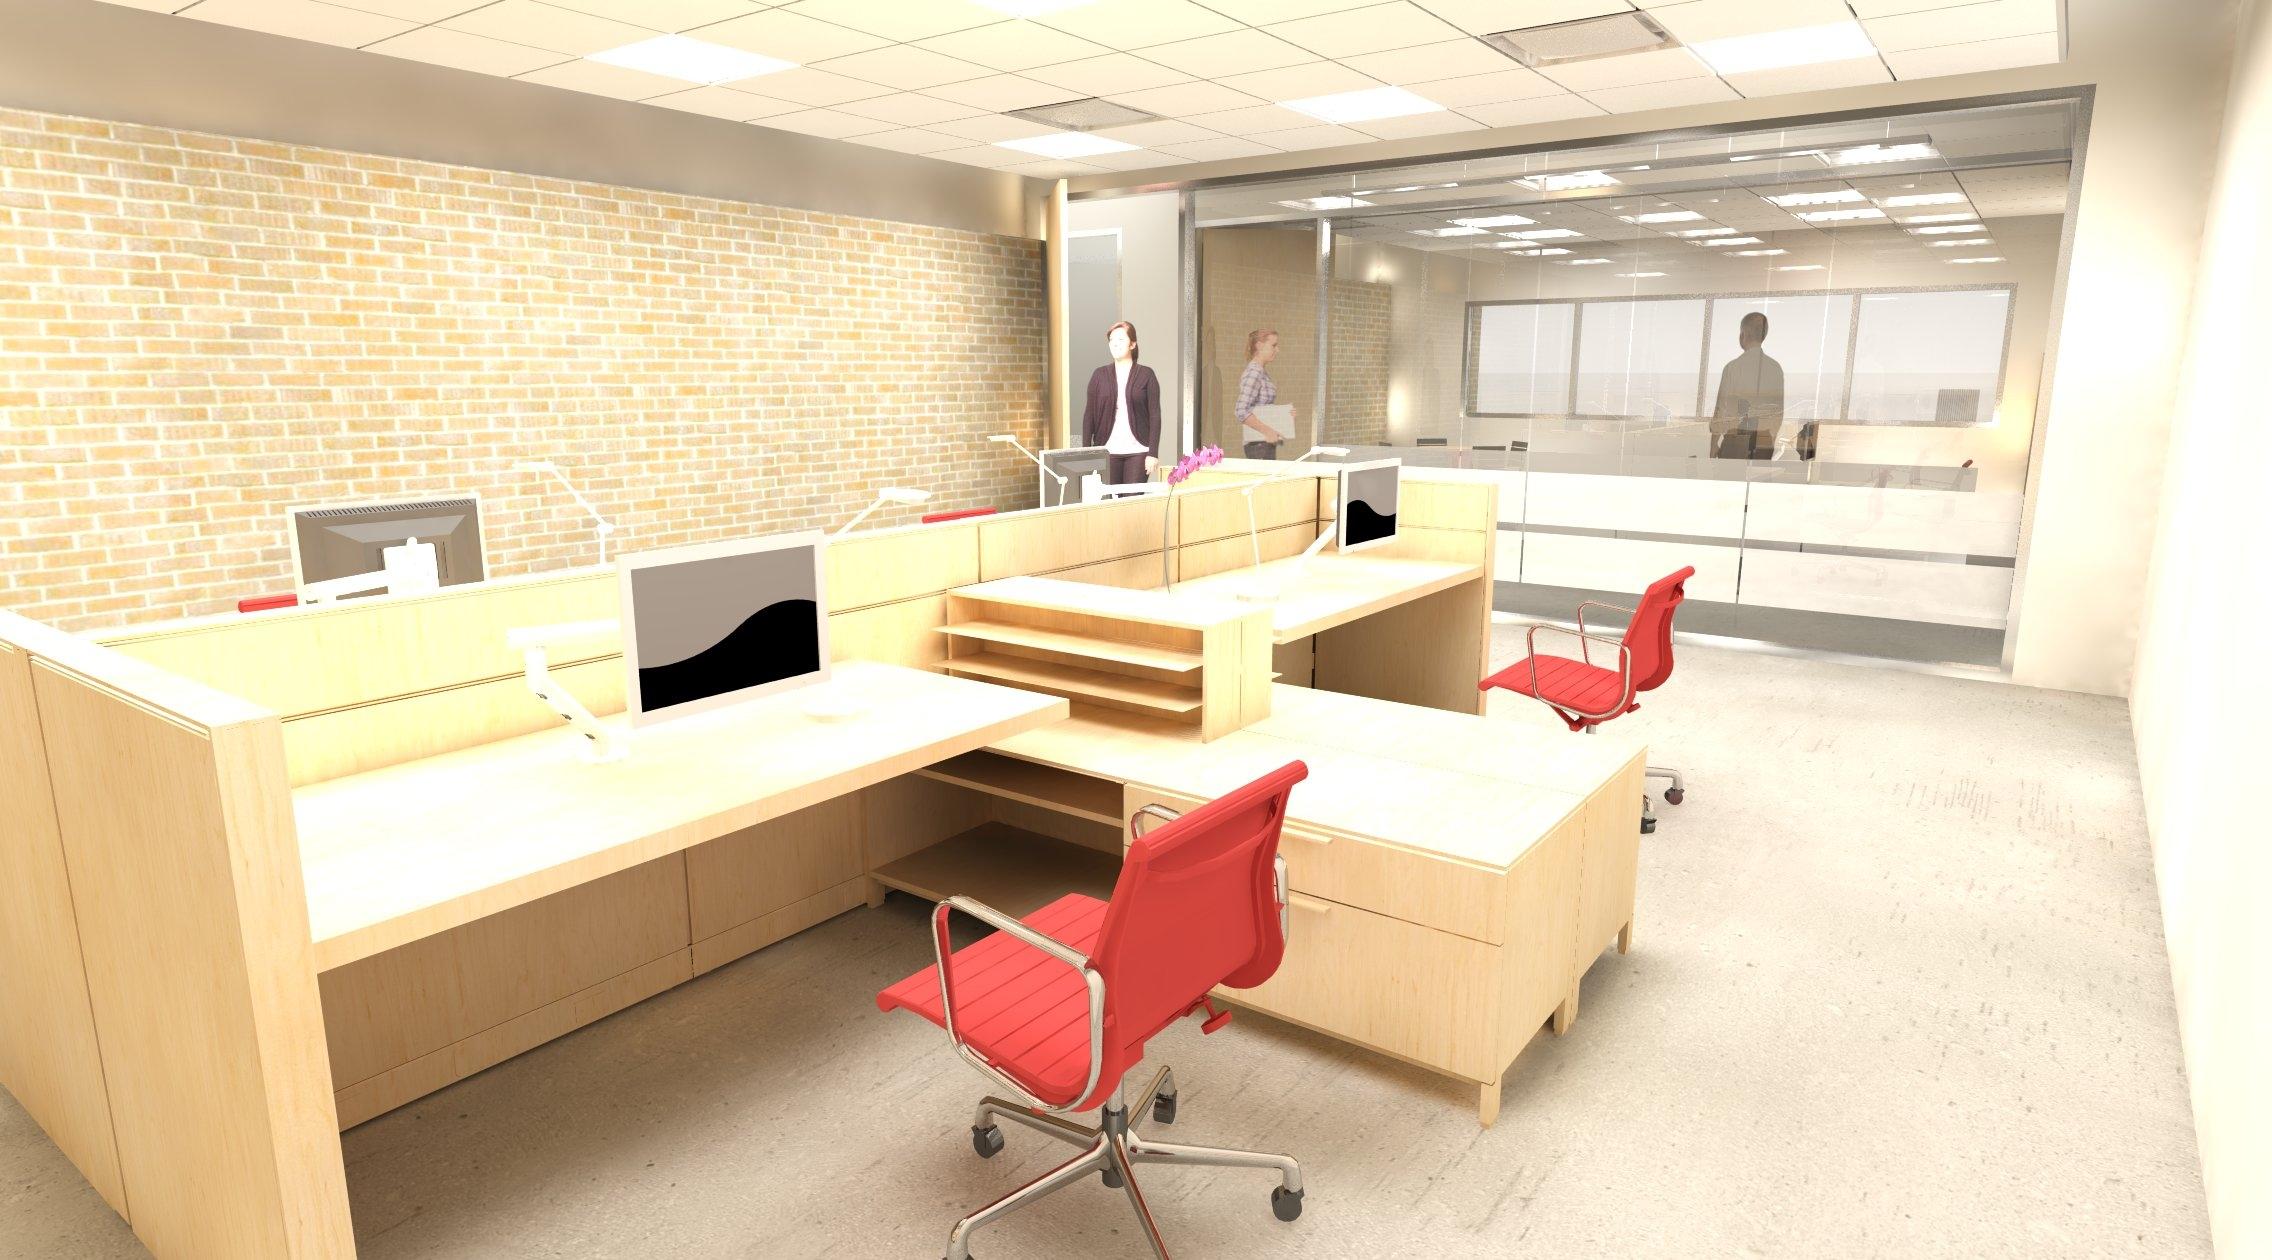 Cohort office rendering